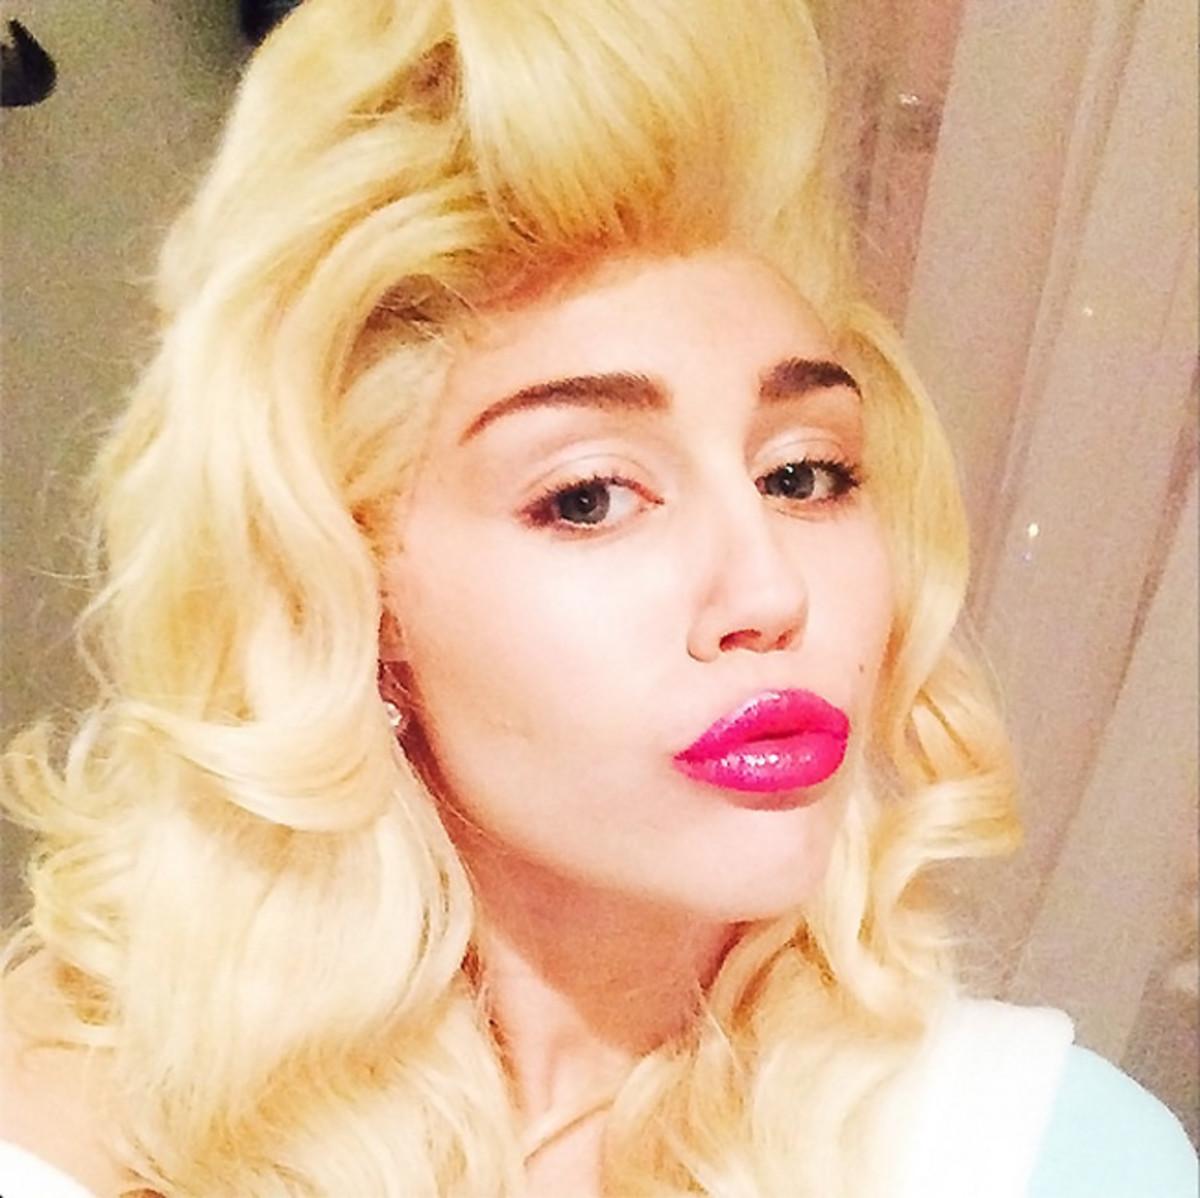 MAC Viva Glam Miley Cyrus_Miley Cyrus instagram